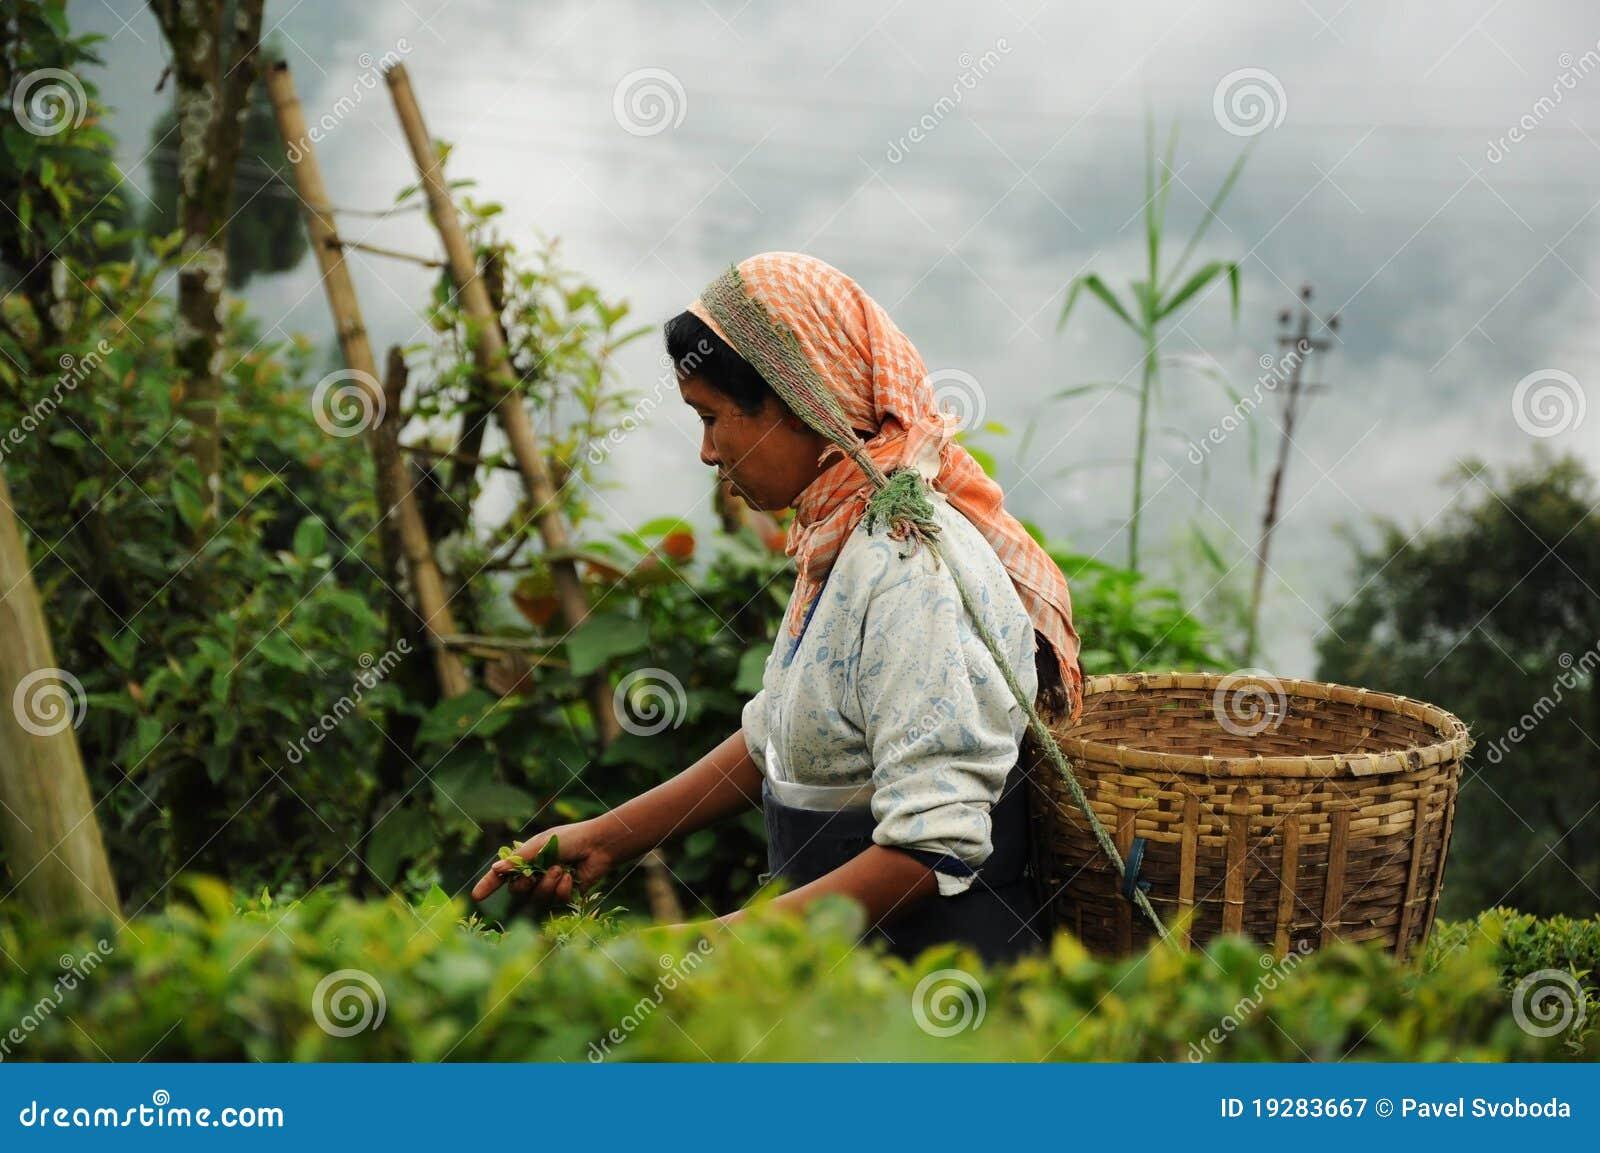 Woman pick tea leafs, Darjeeling, India